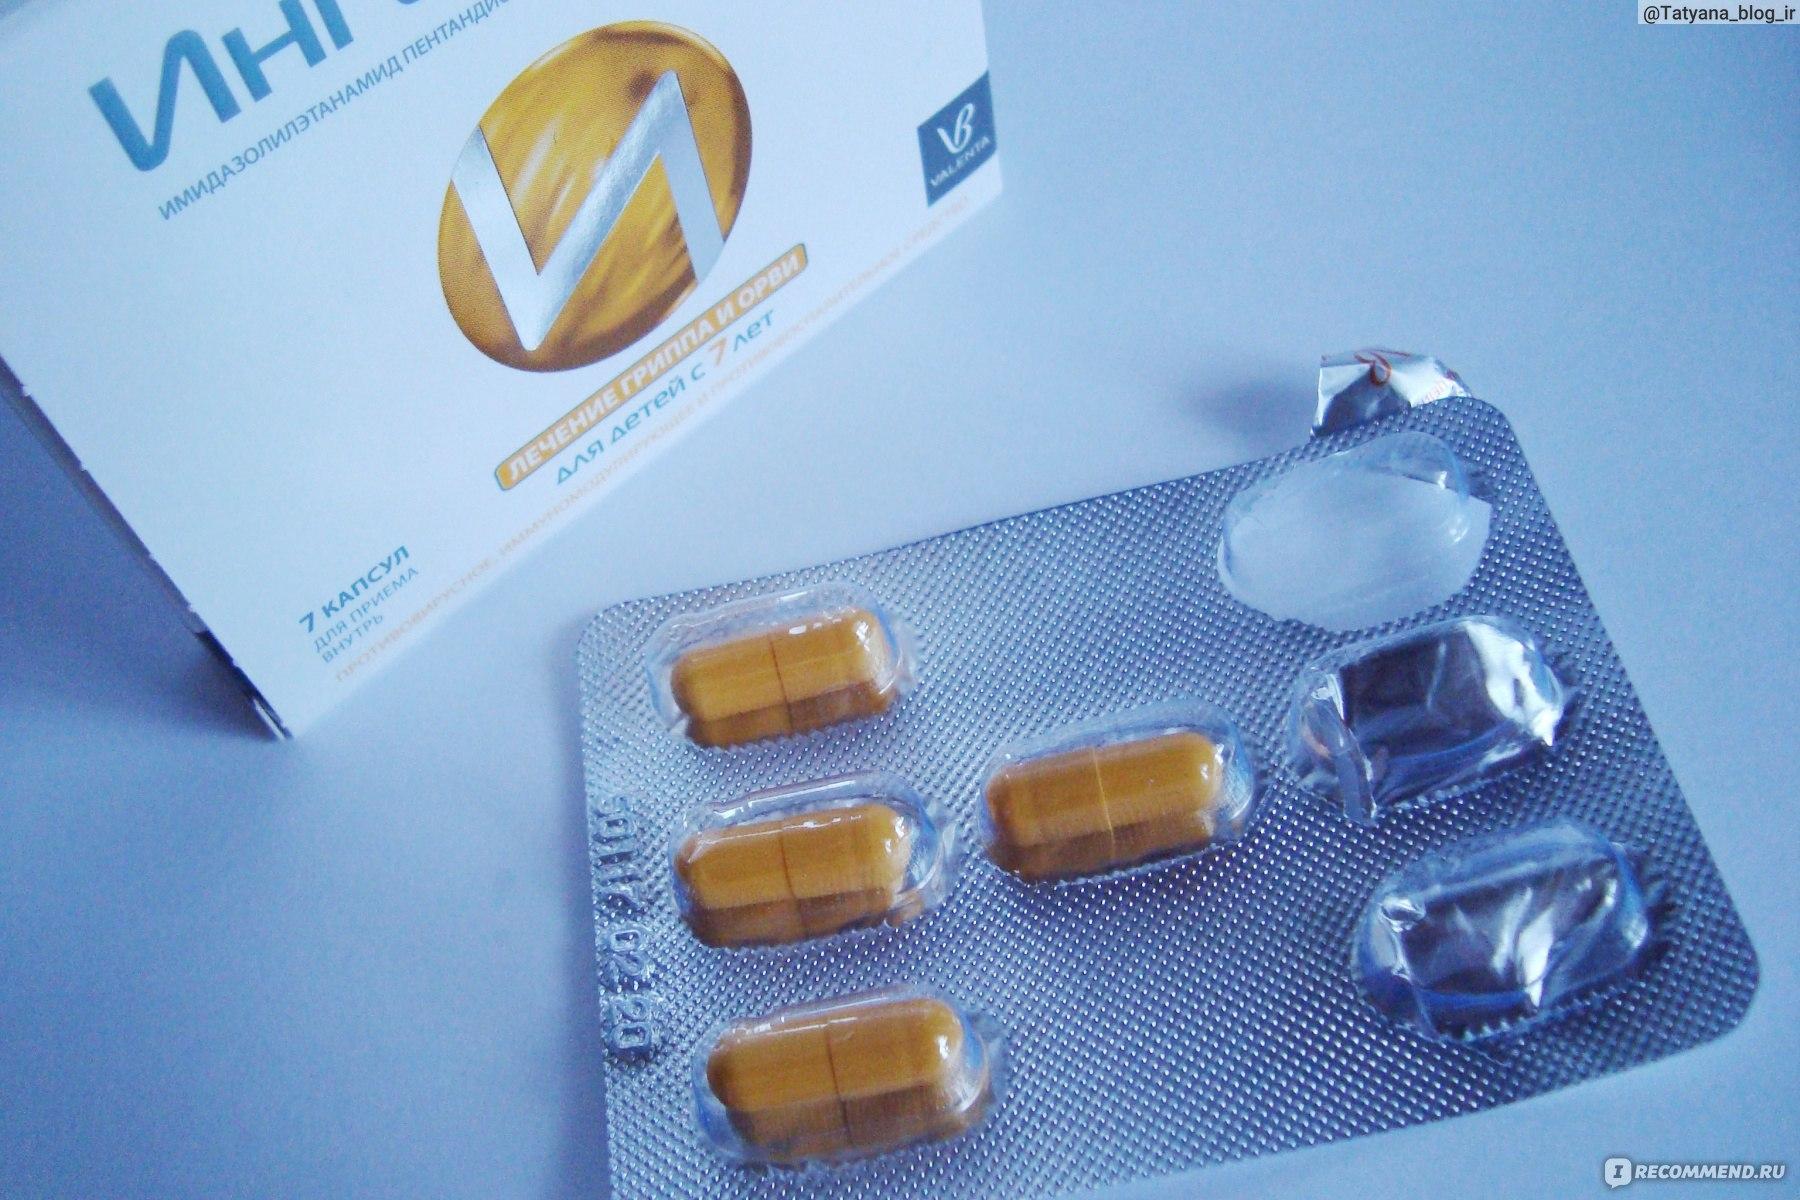 Ингавирин инструкция лекарственного препарата | yotra. Ru.